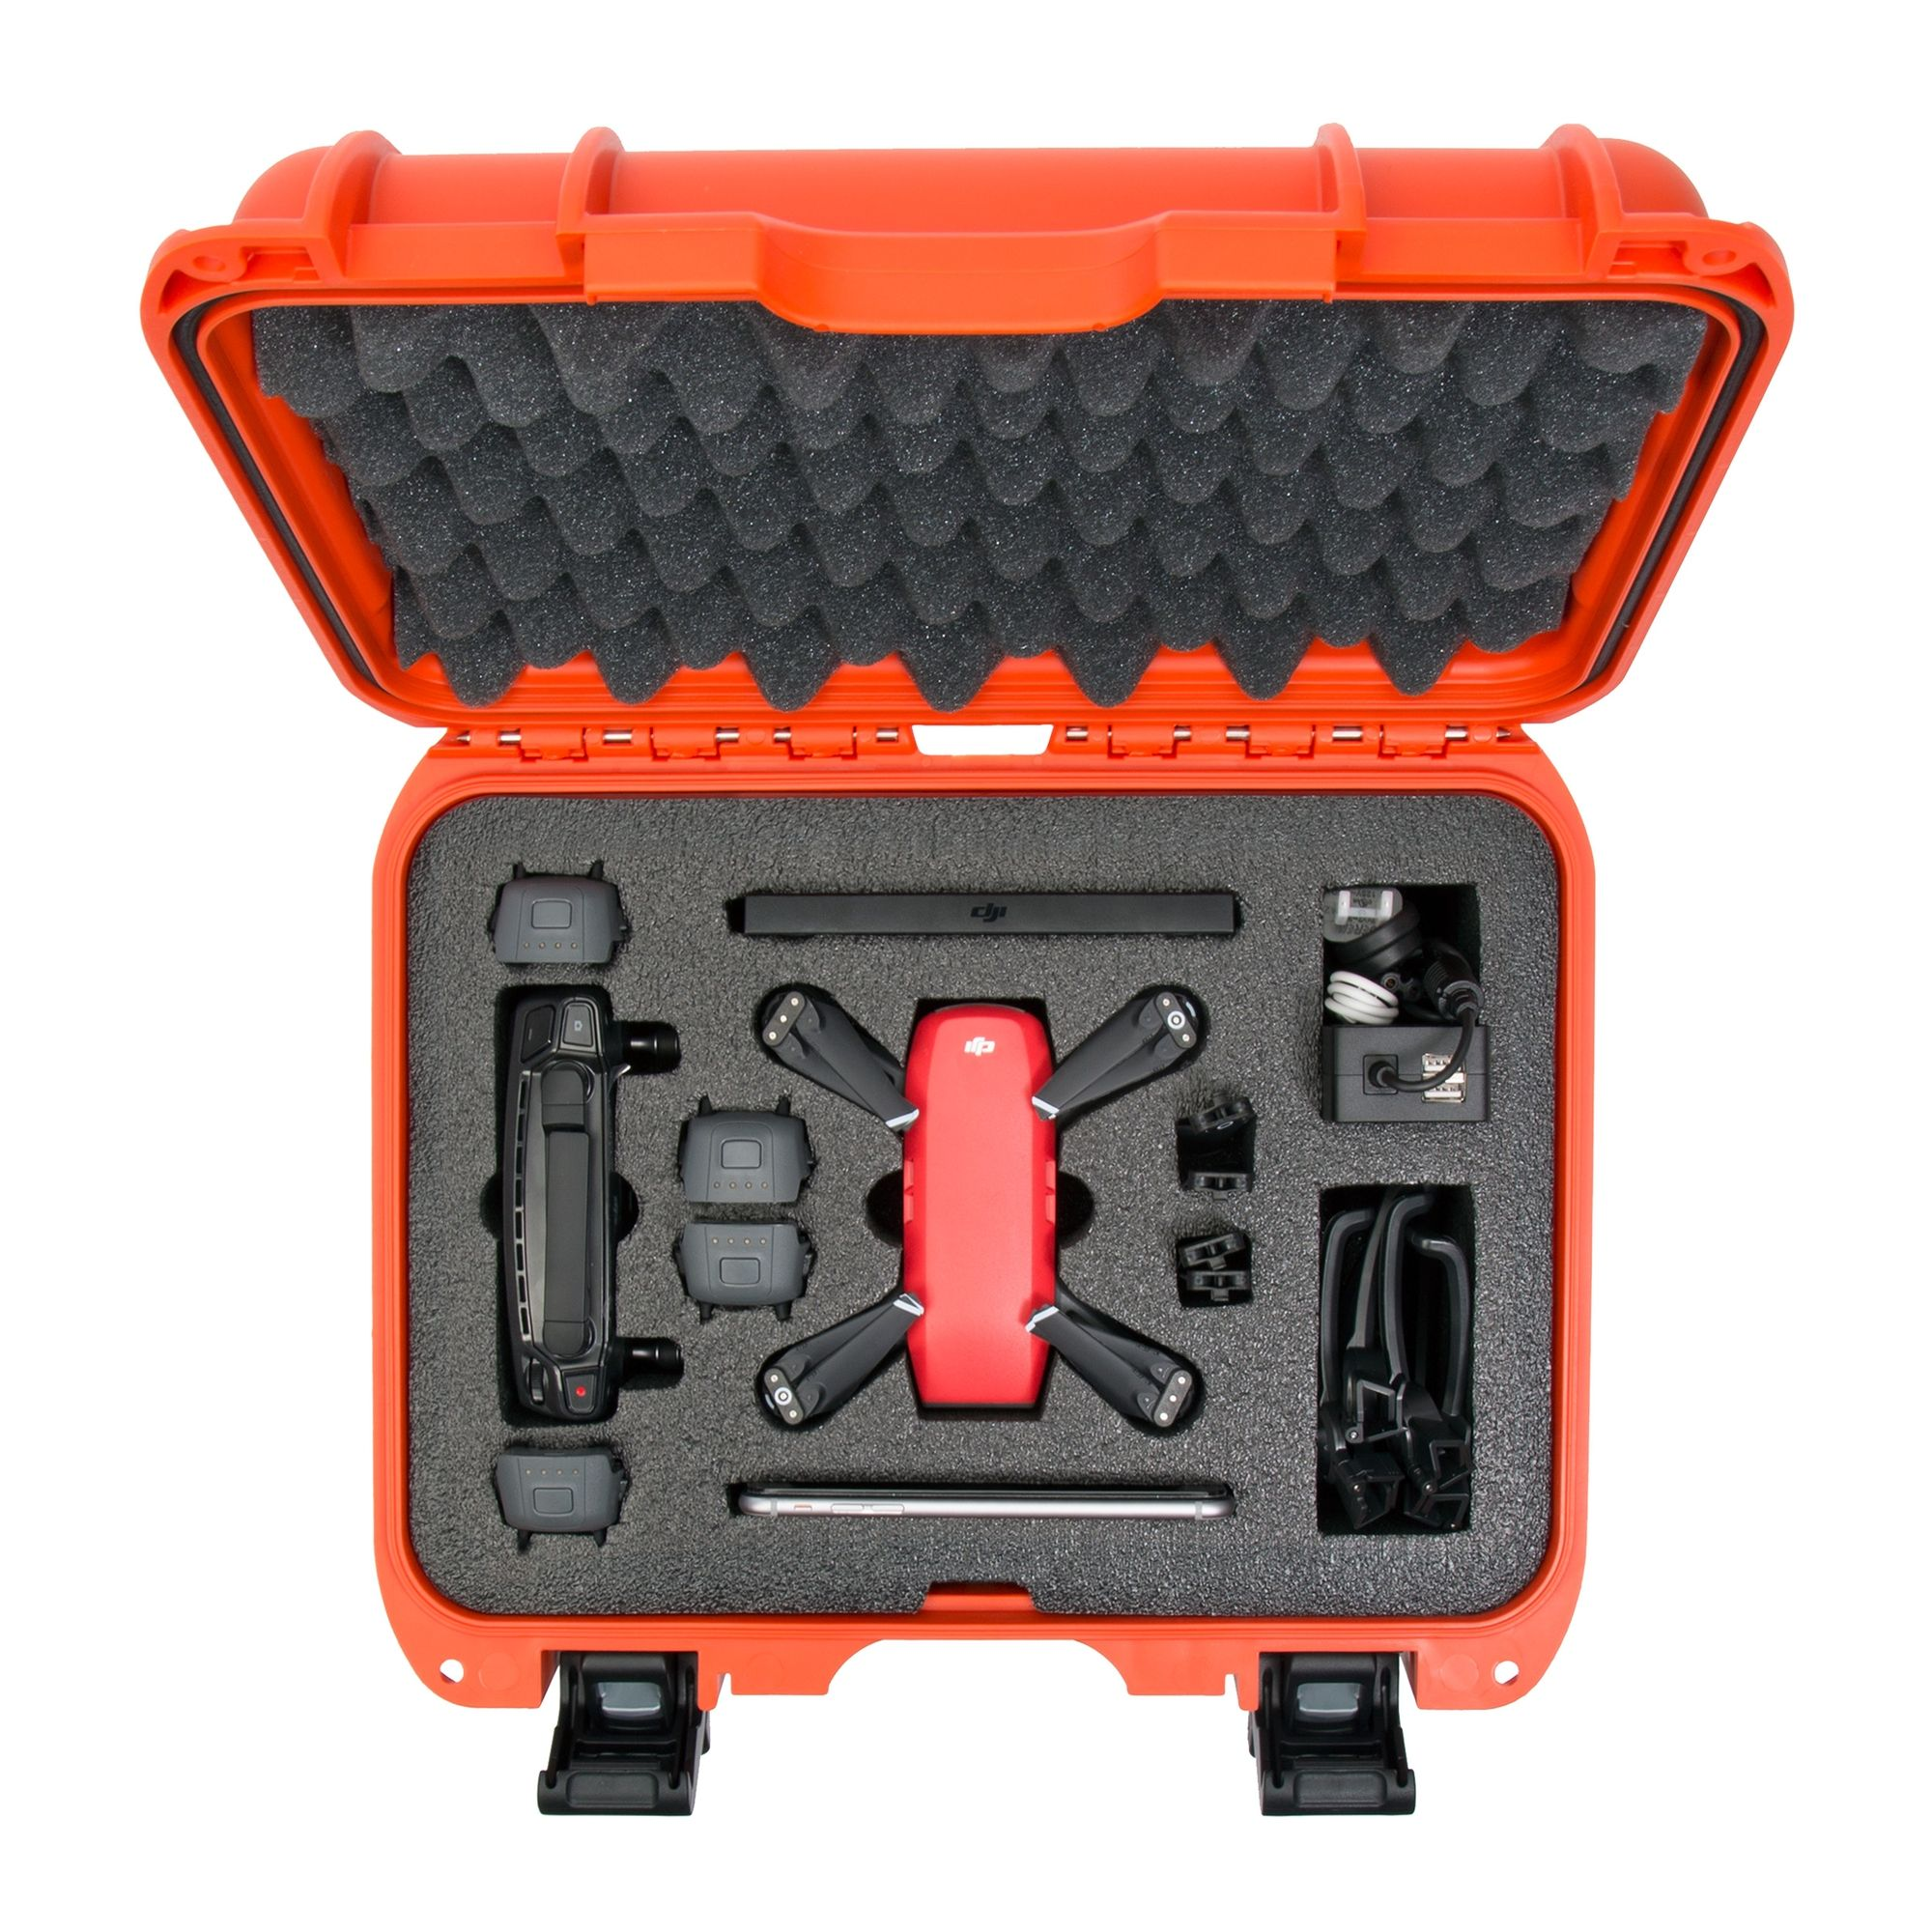 915For DJI™ Spark Fly More | Media Series | Small drones, Dji spark